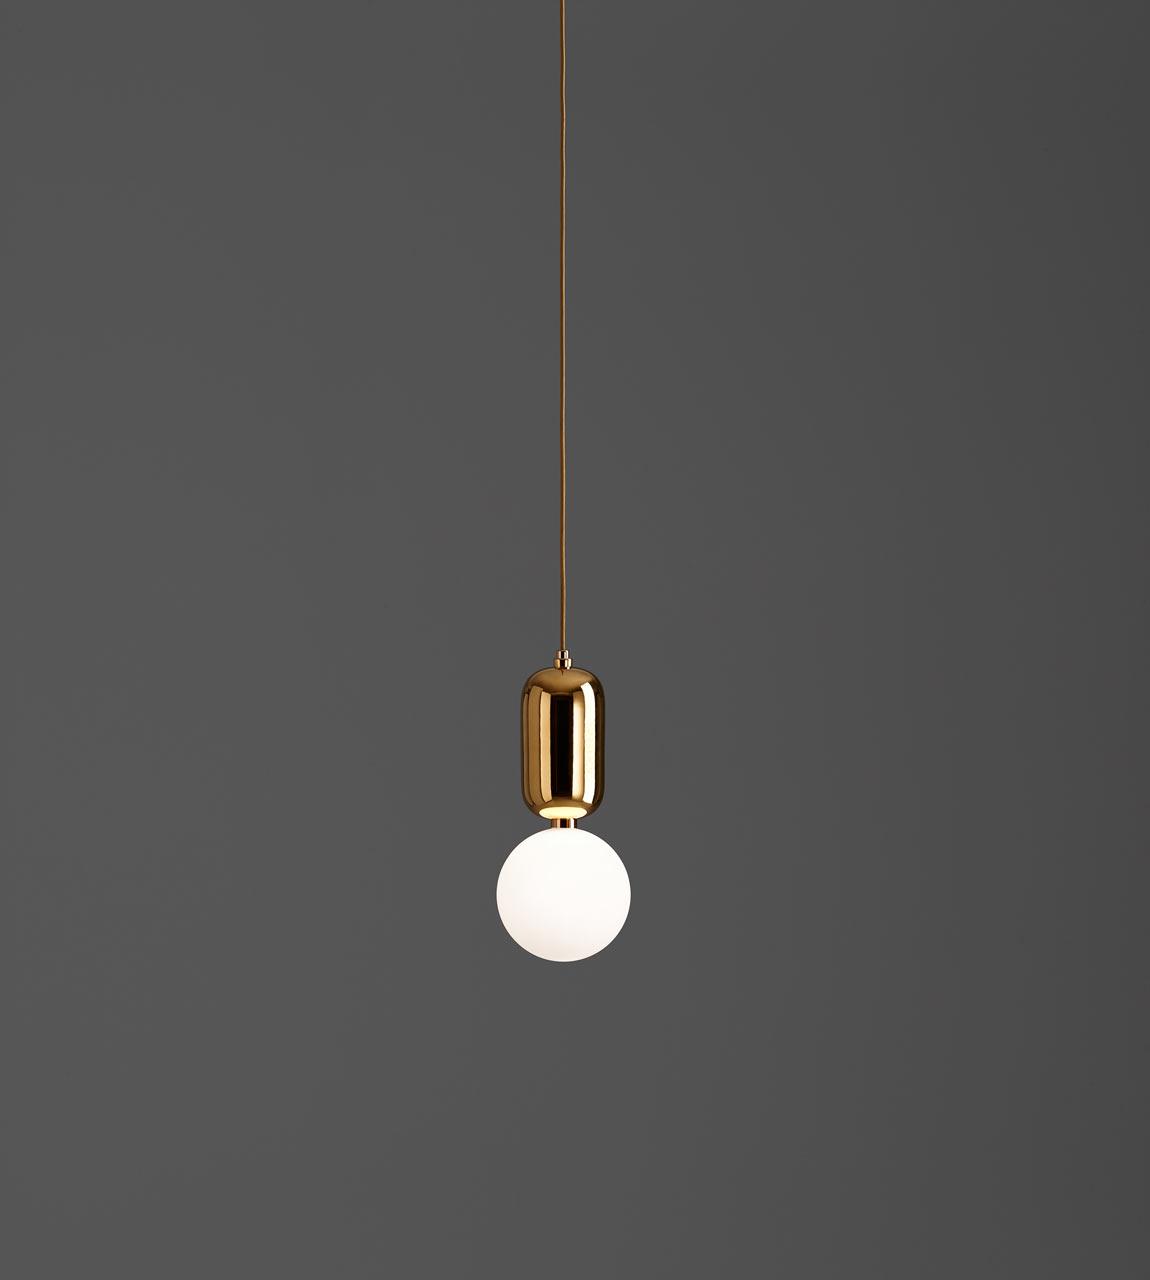 Parachilna-Lighting-14-Aballs-Hayon